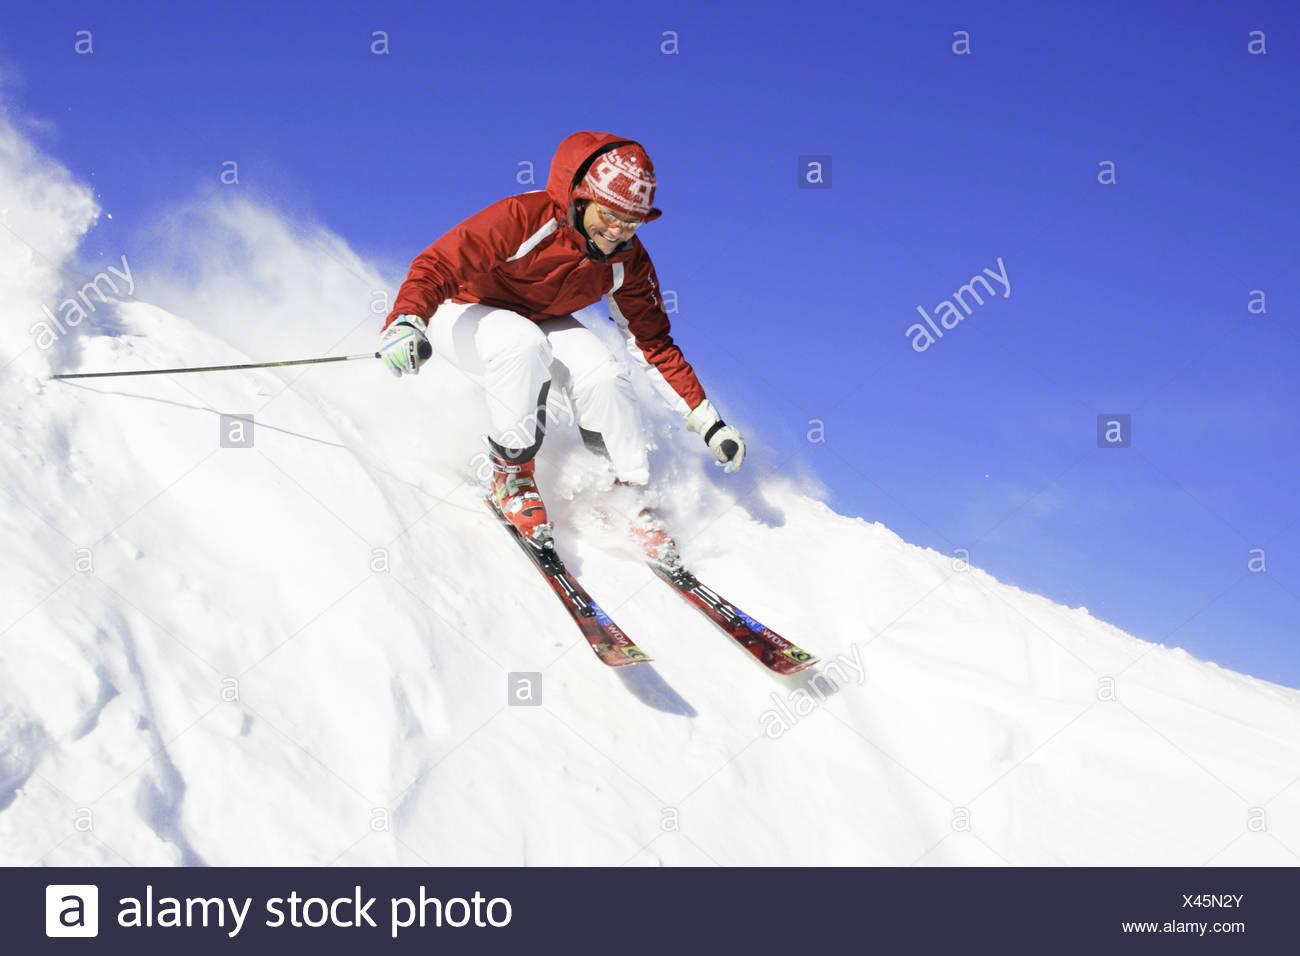 skier racing downhill, Austria, Alps - Stock Image